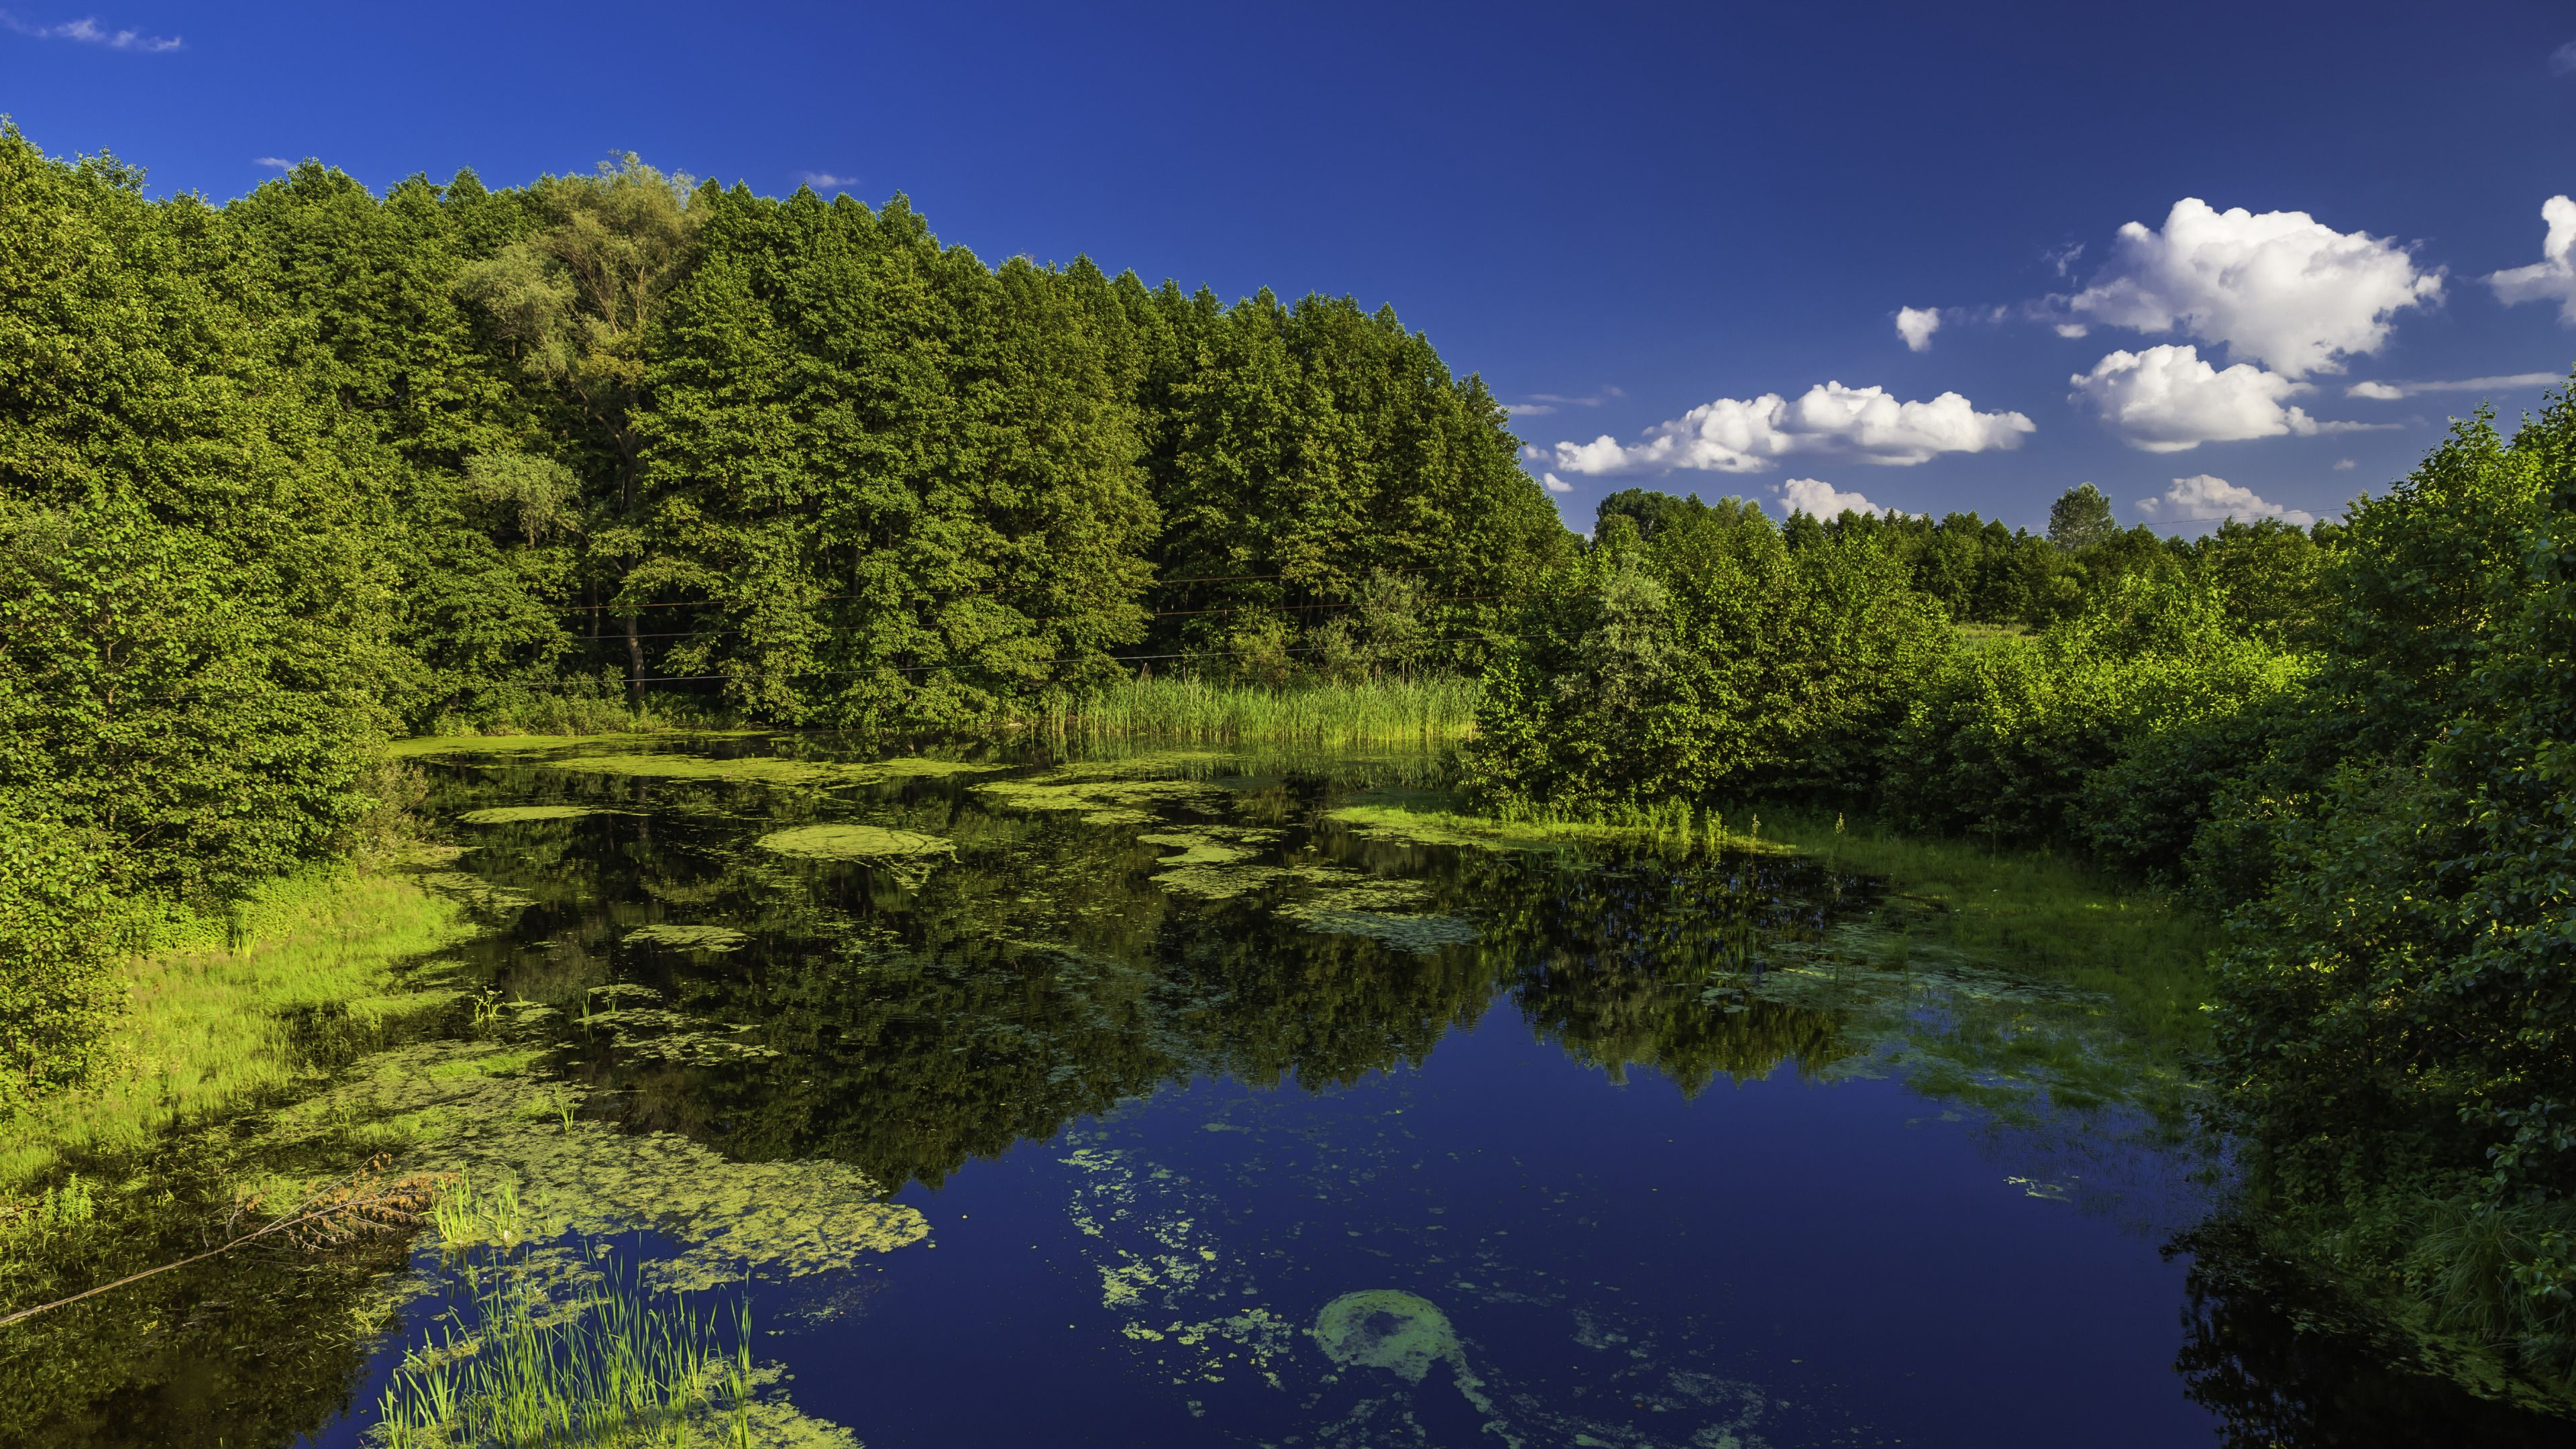 2160 X 1440 Resolution Wallpaper Wallpapersafari Landscape Nature Landscape Photography